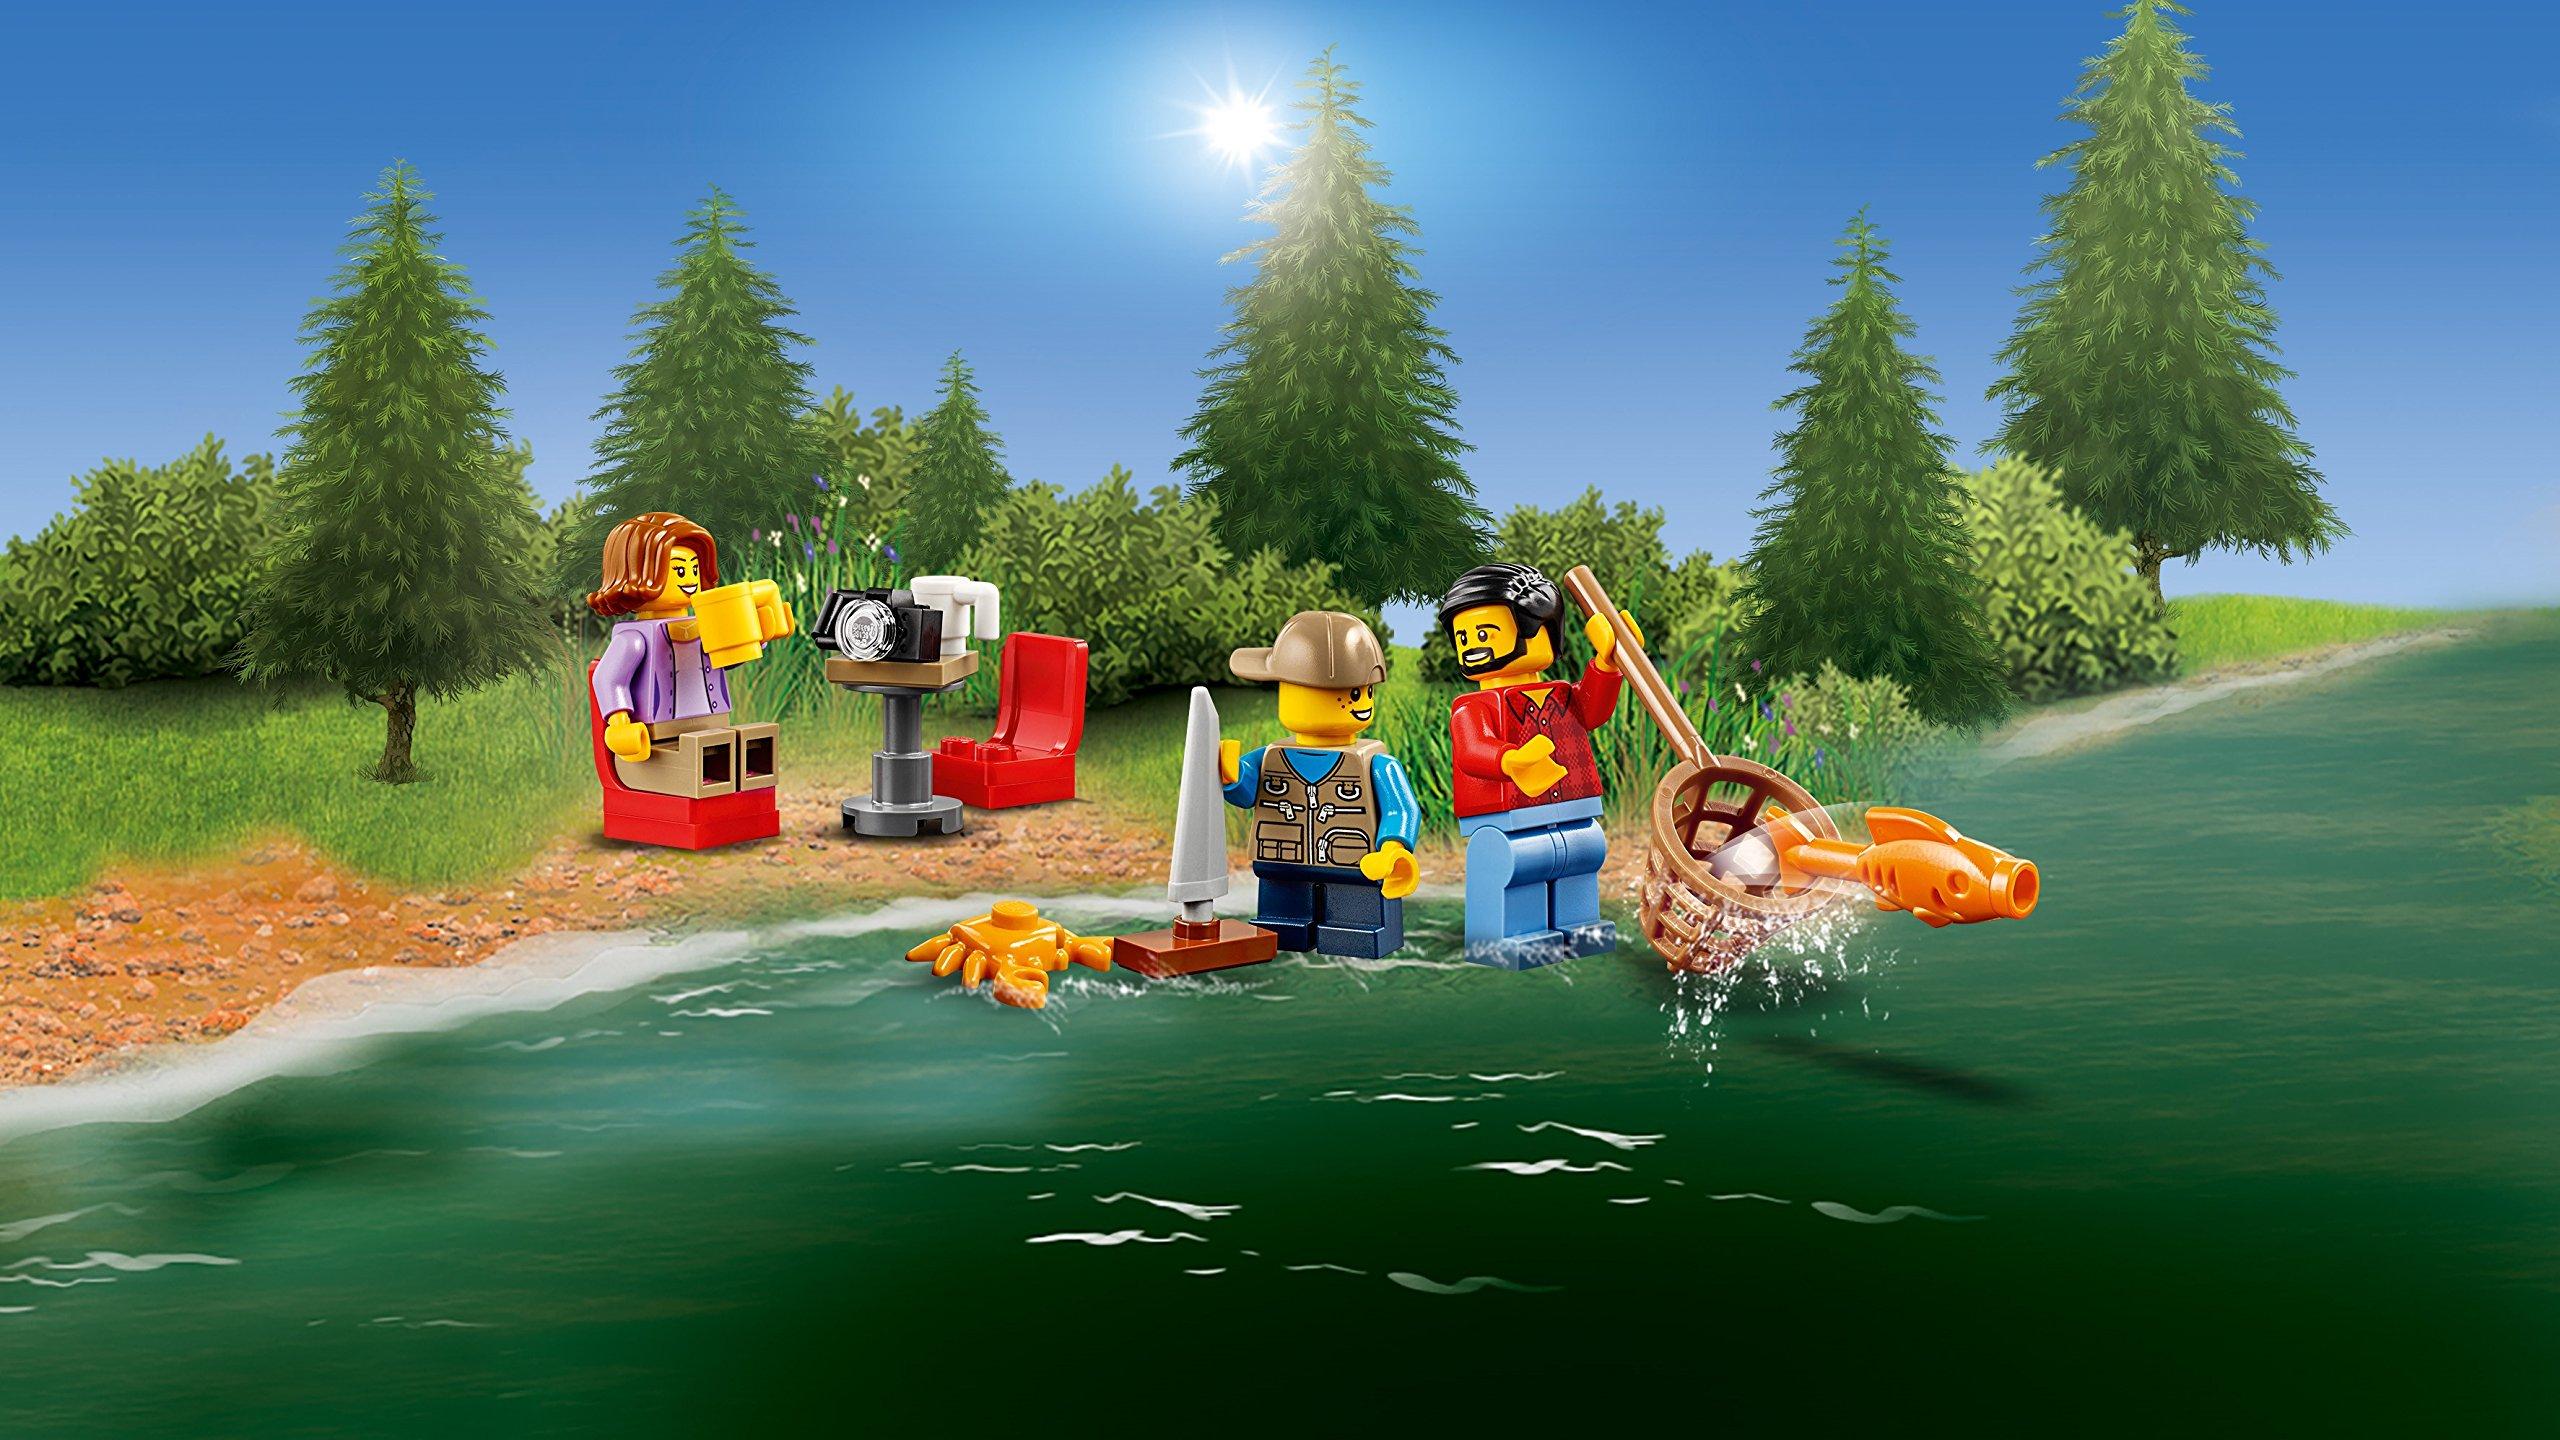 LEGO- City Pickup e Caravan, Multicolore, 60182 5 spesavip